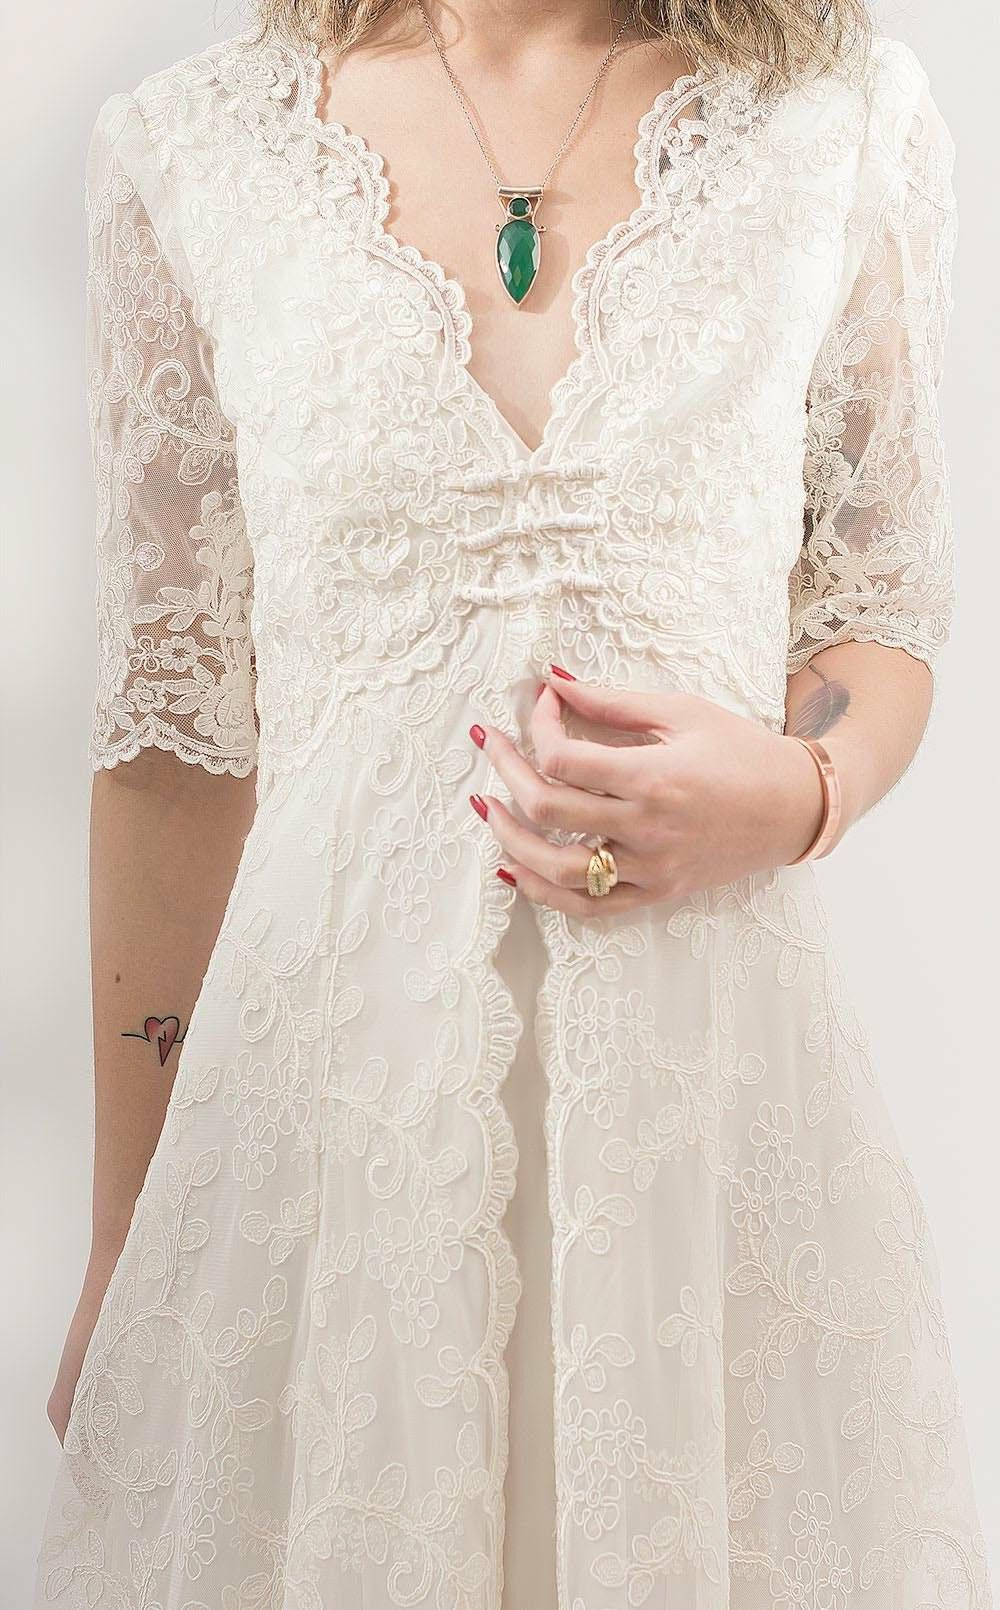 Bohostyle lace wedding dress, casual wedding dress